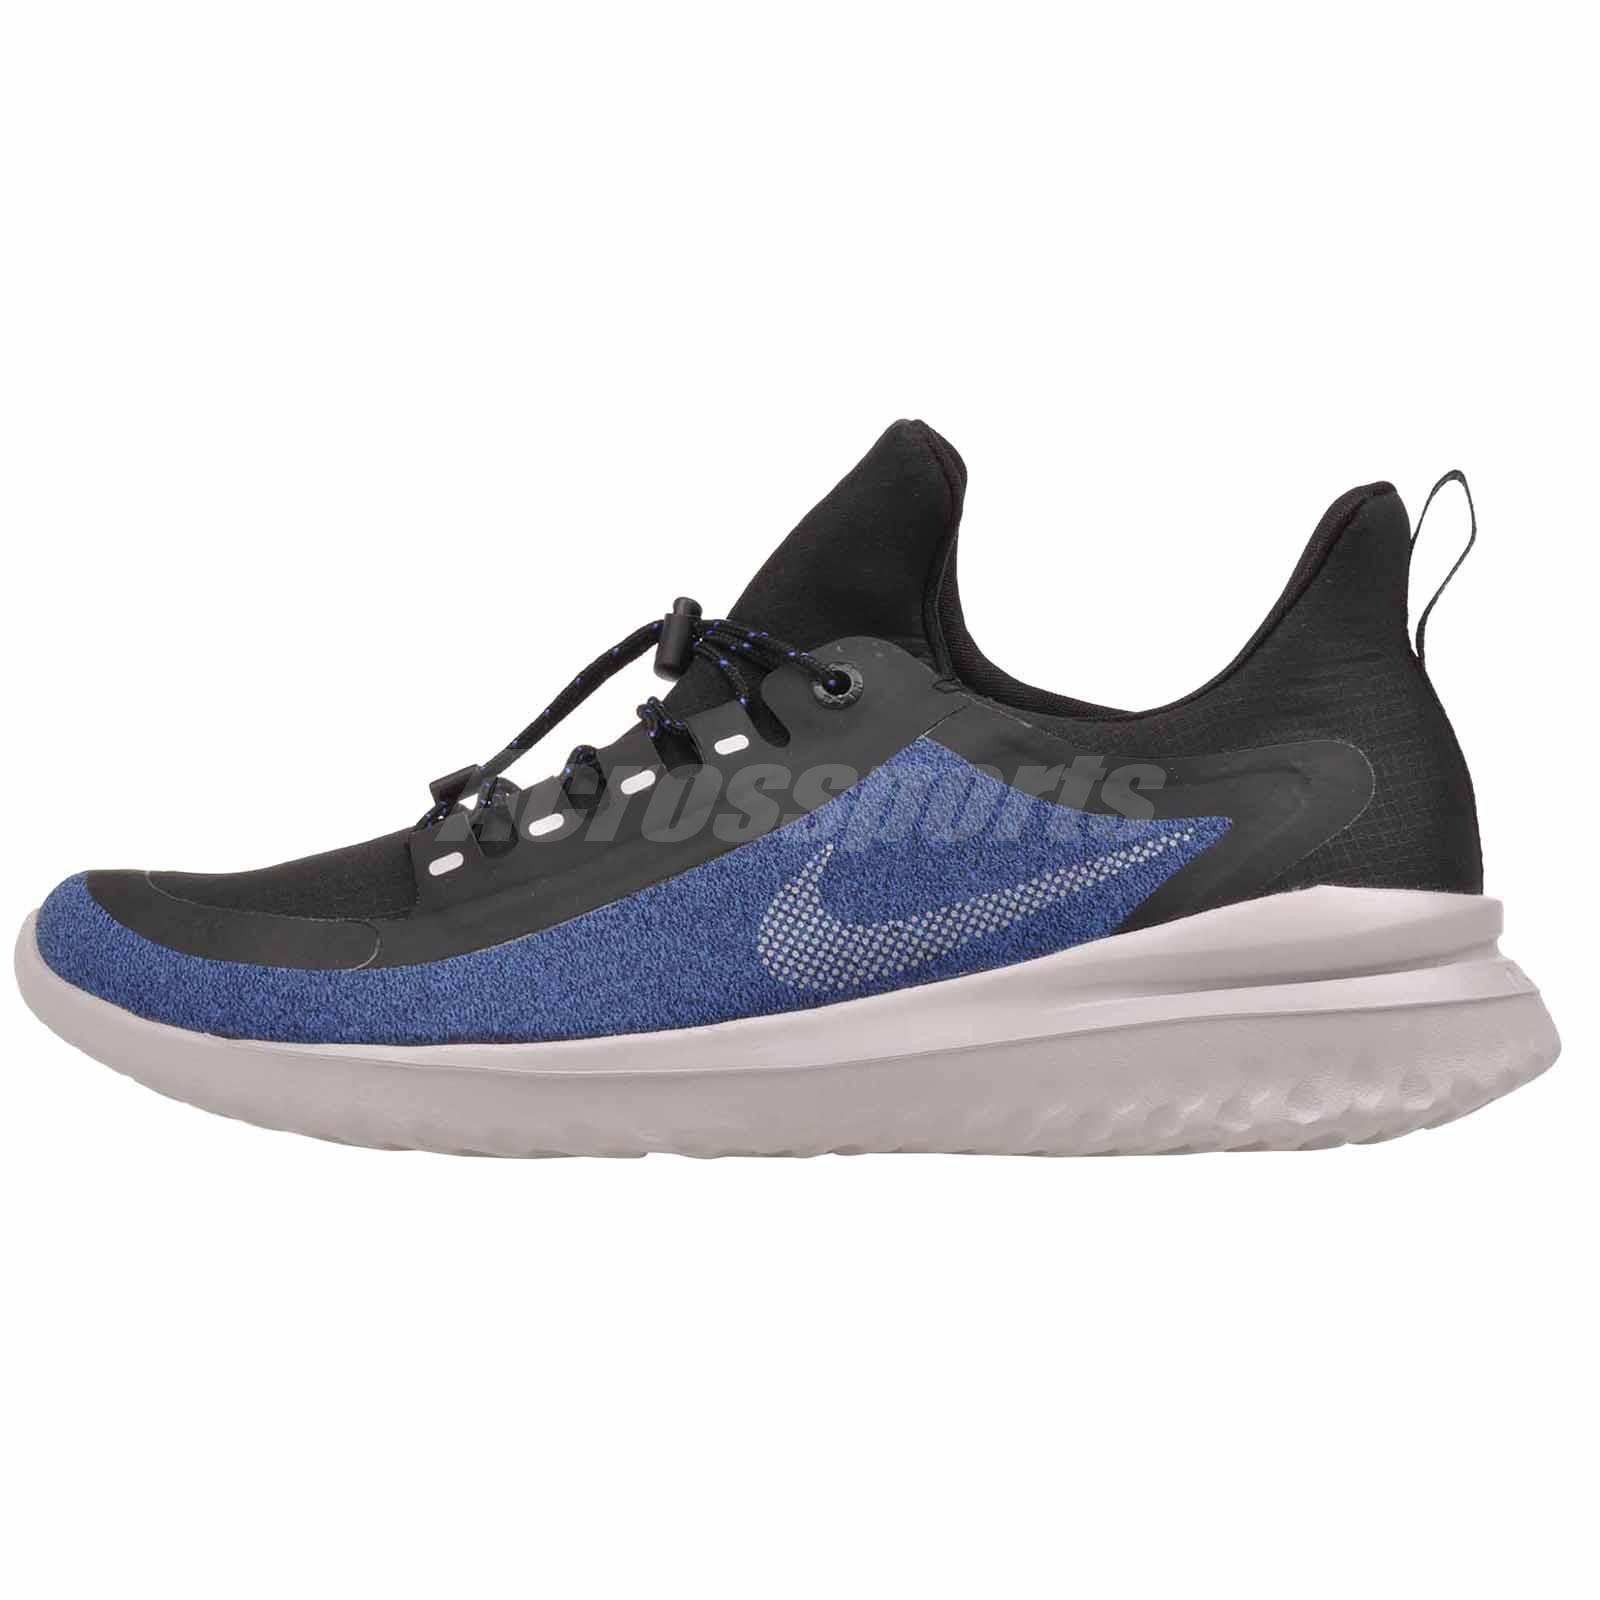 quality design 24ca5 7a811 Nike Renew Rival Shield Running Mens Shoes Black AR0022-002 | eBay